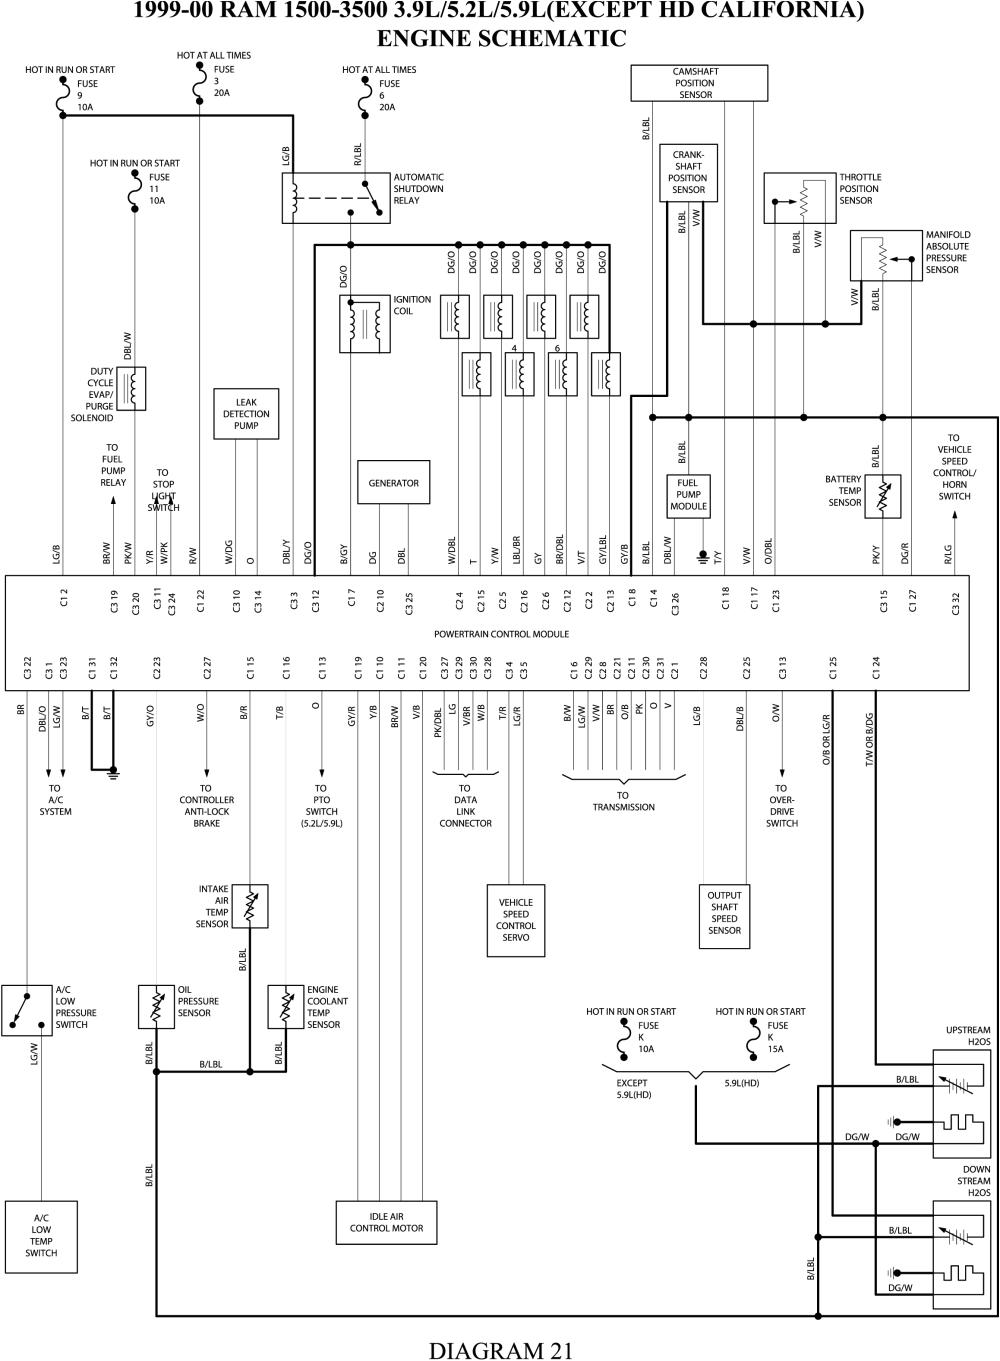 ignition wiring diagram 2004 dodge ram wiring diagram for you 2004 dodge ram 1500 ignition wiring diagram 04 dodge ram ignition wiring